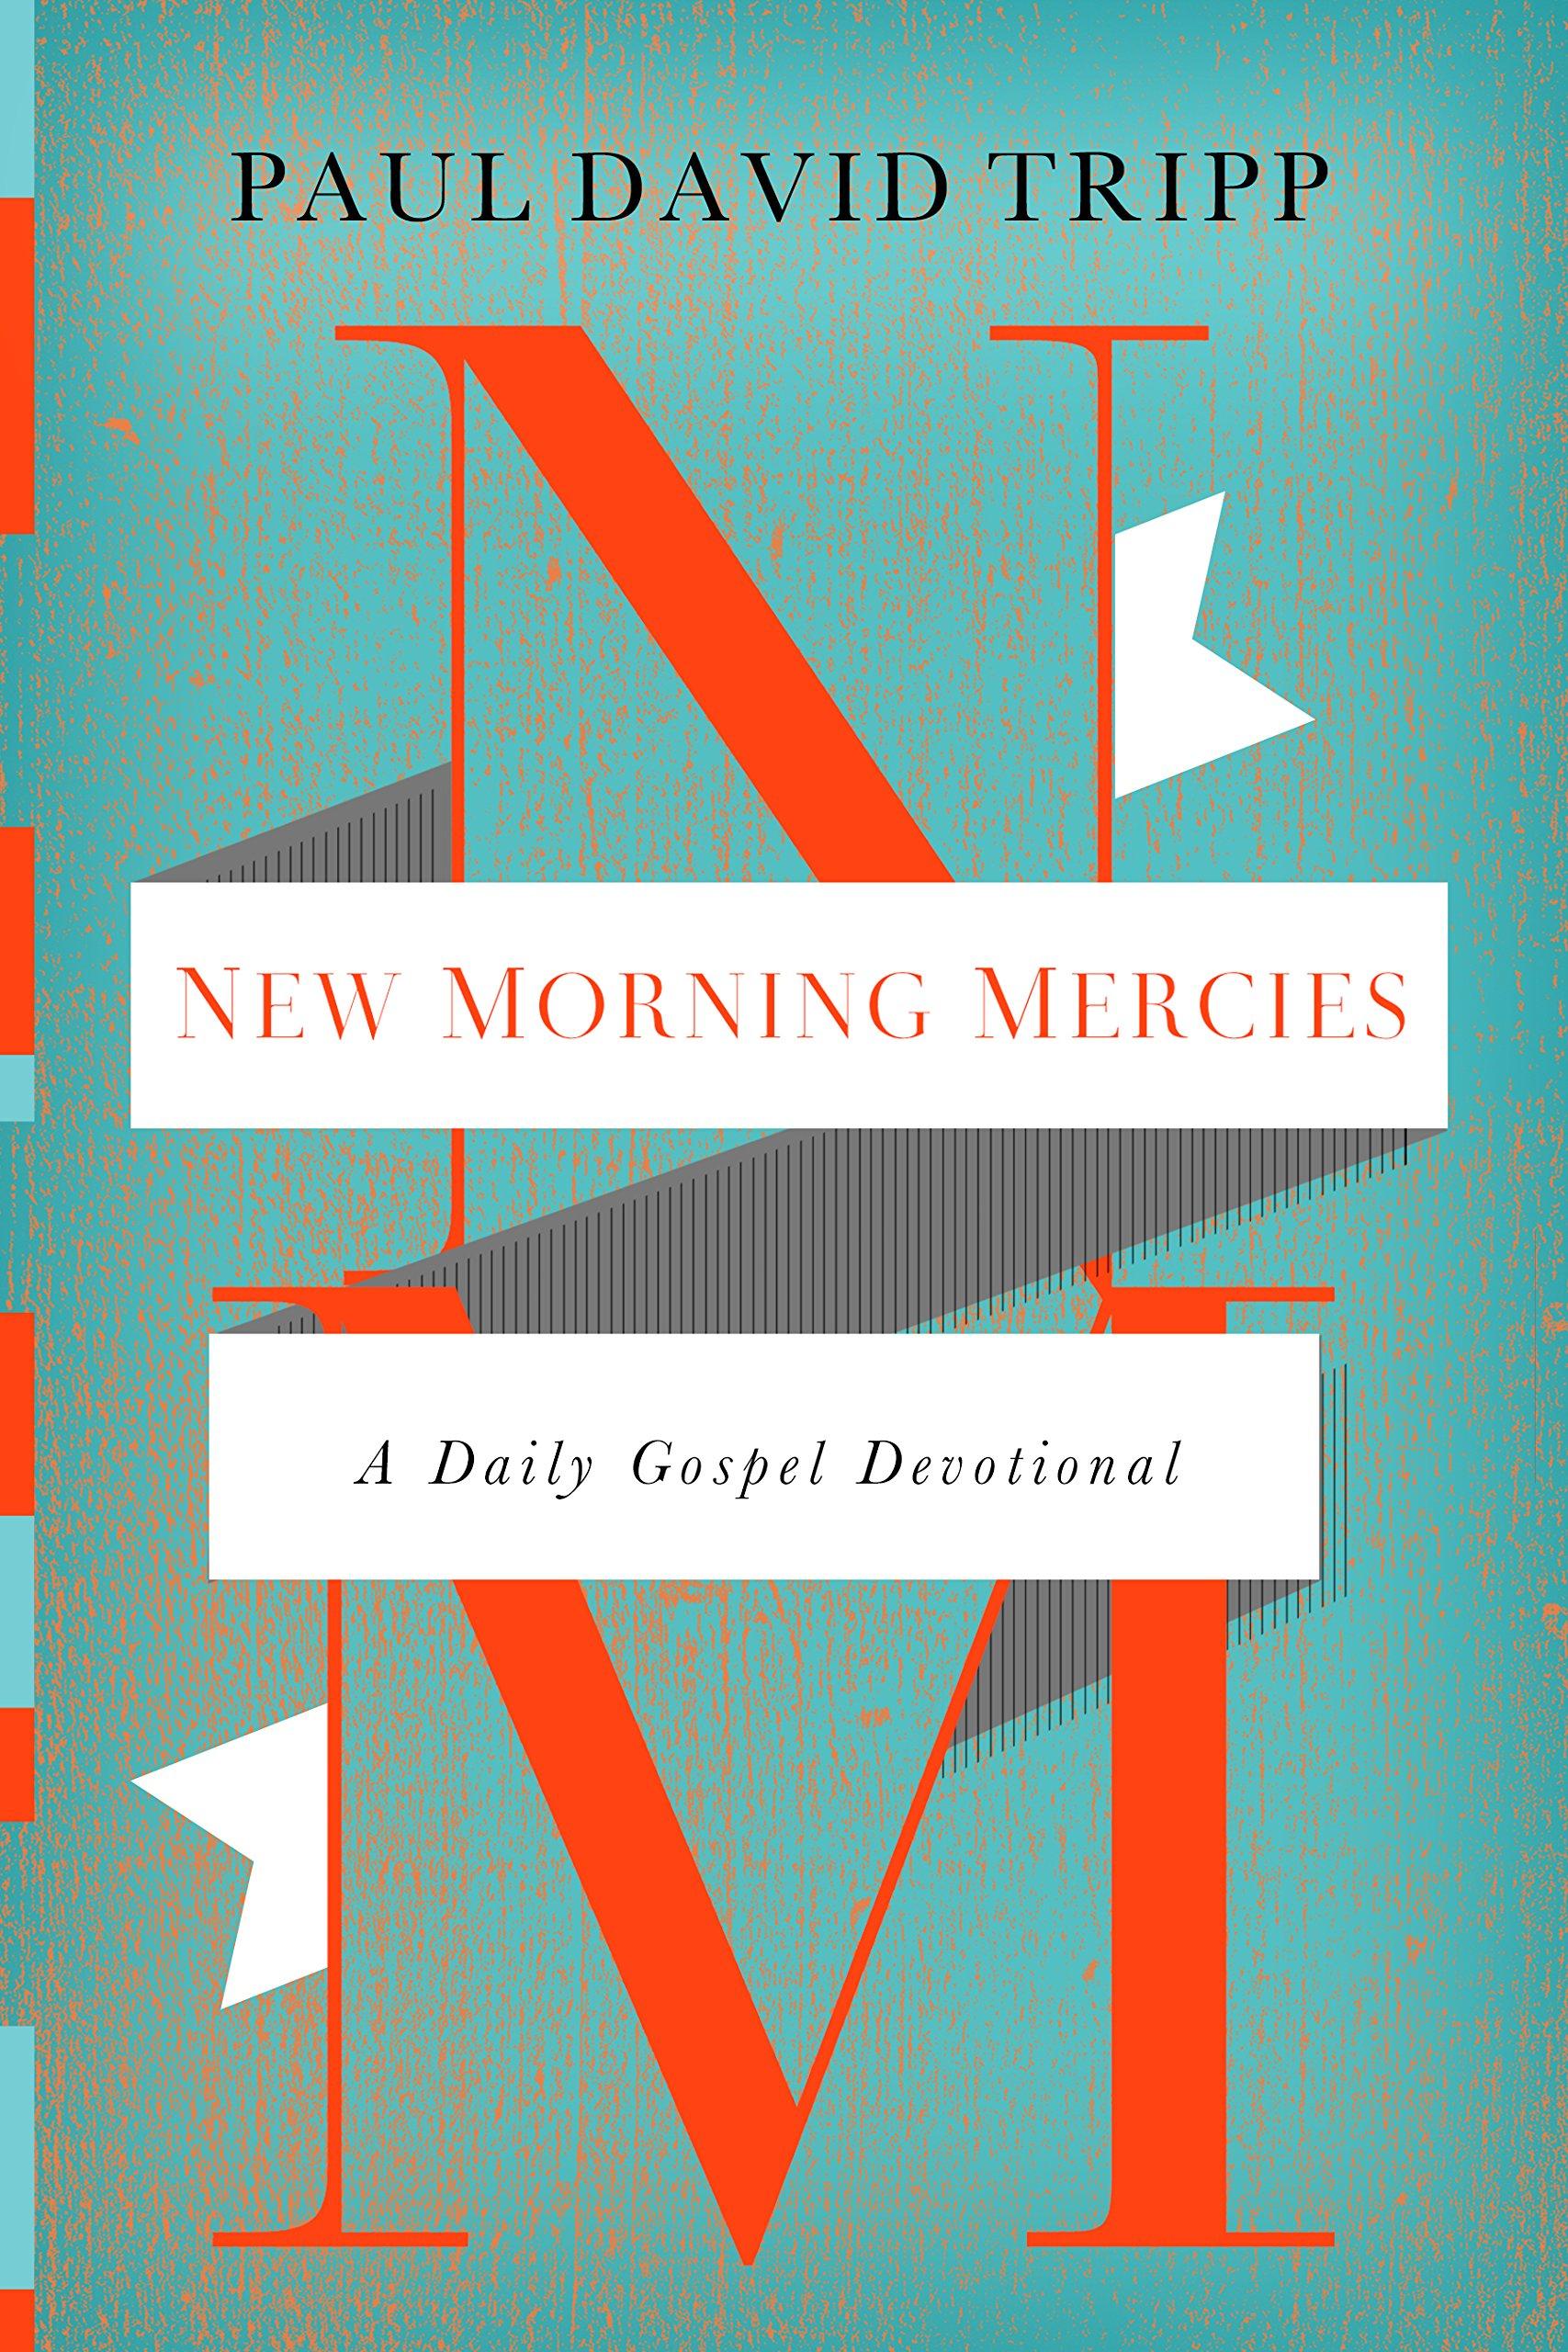 New Morning Mercies Gospel Devotional product image